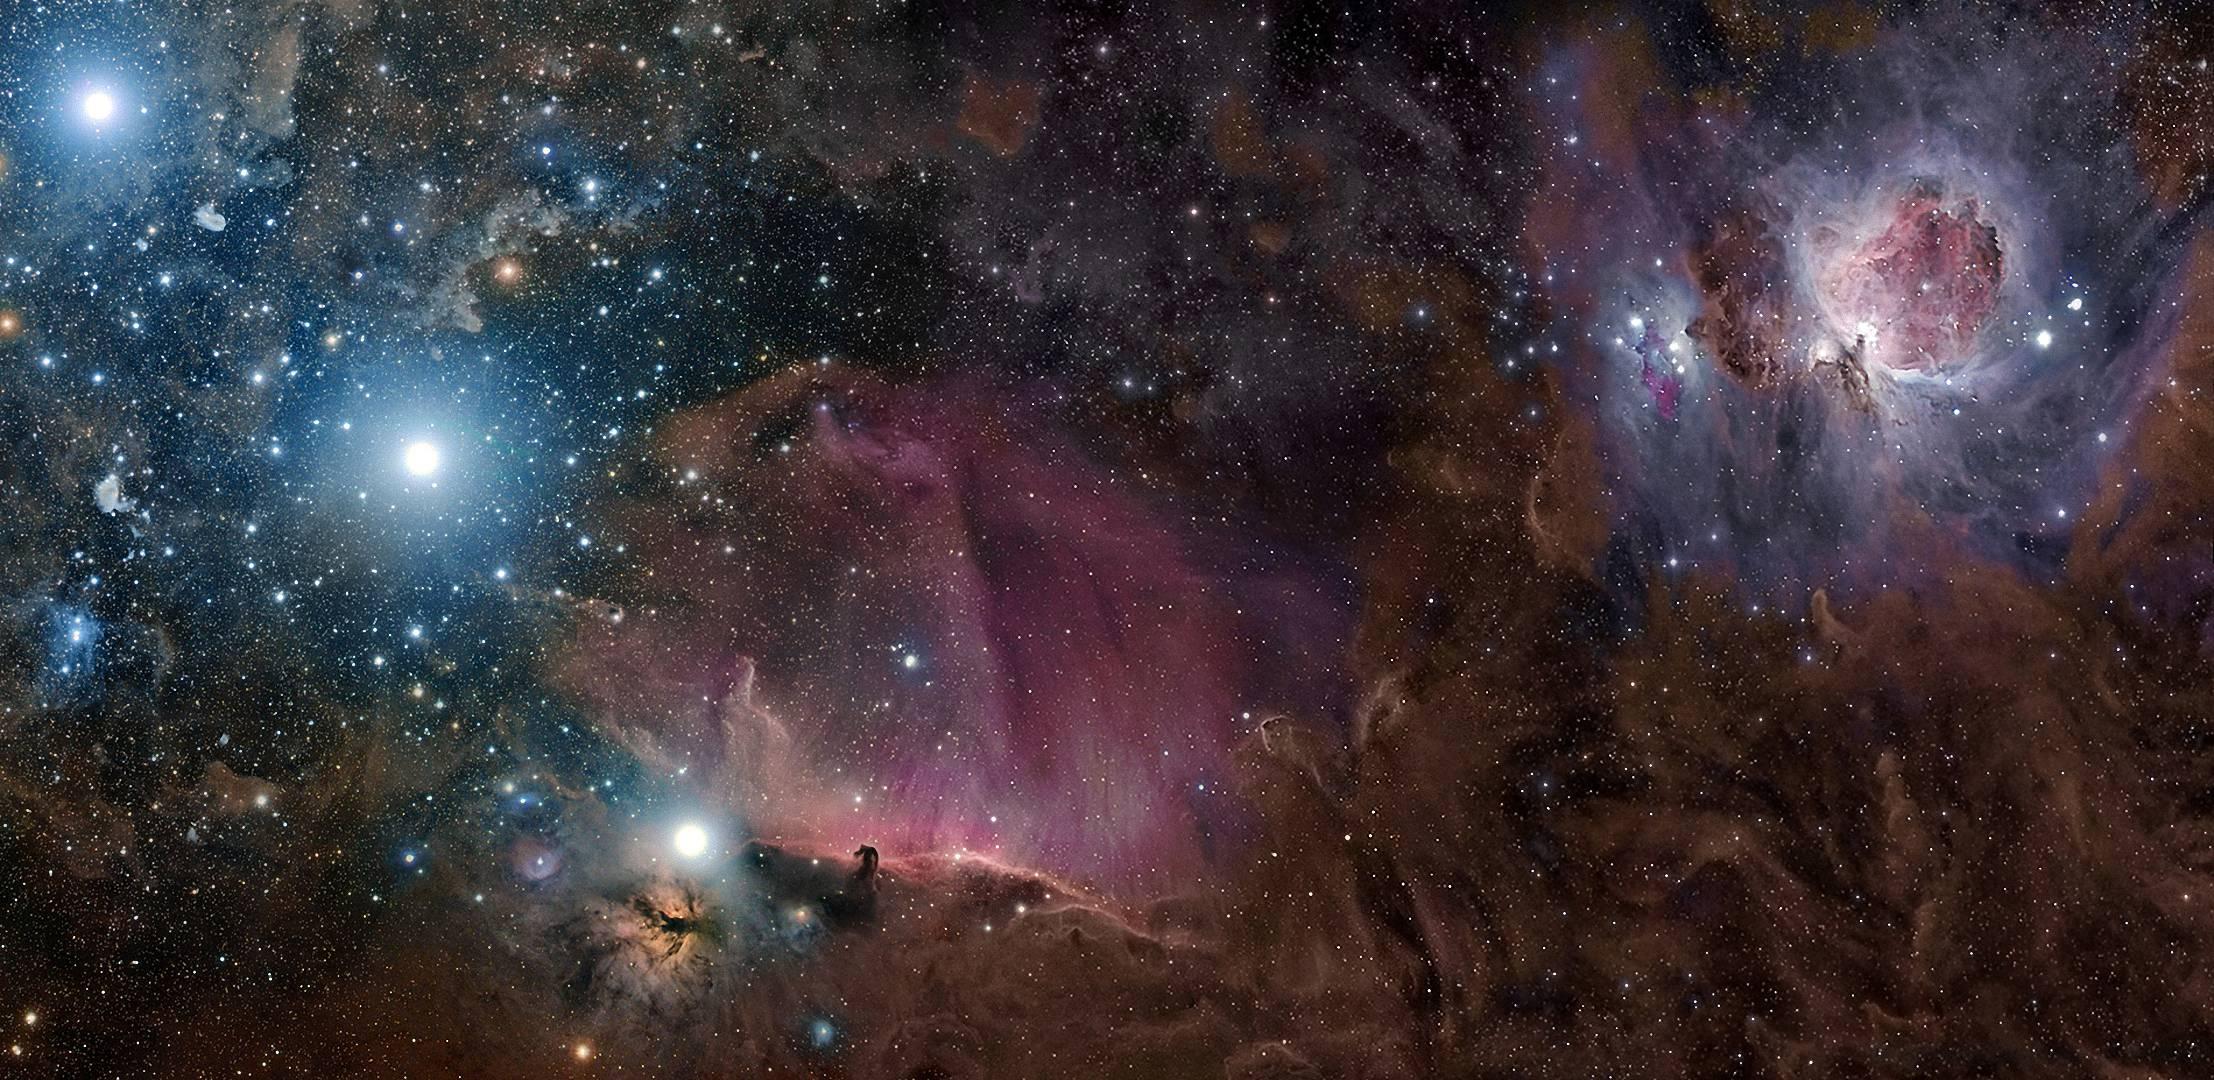 nasa orion constellation wallpaper - photo #3